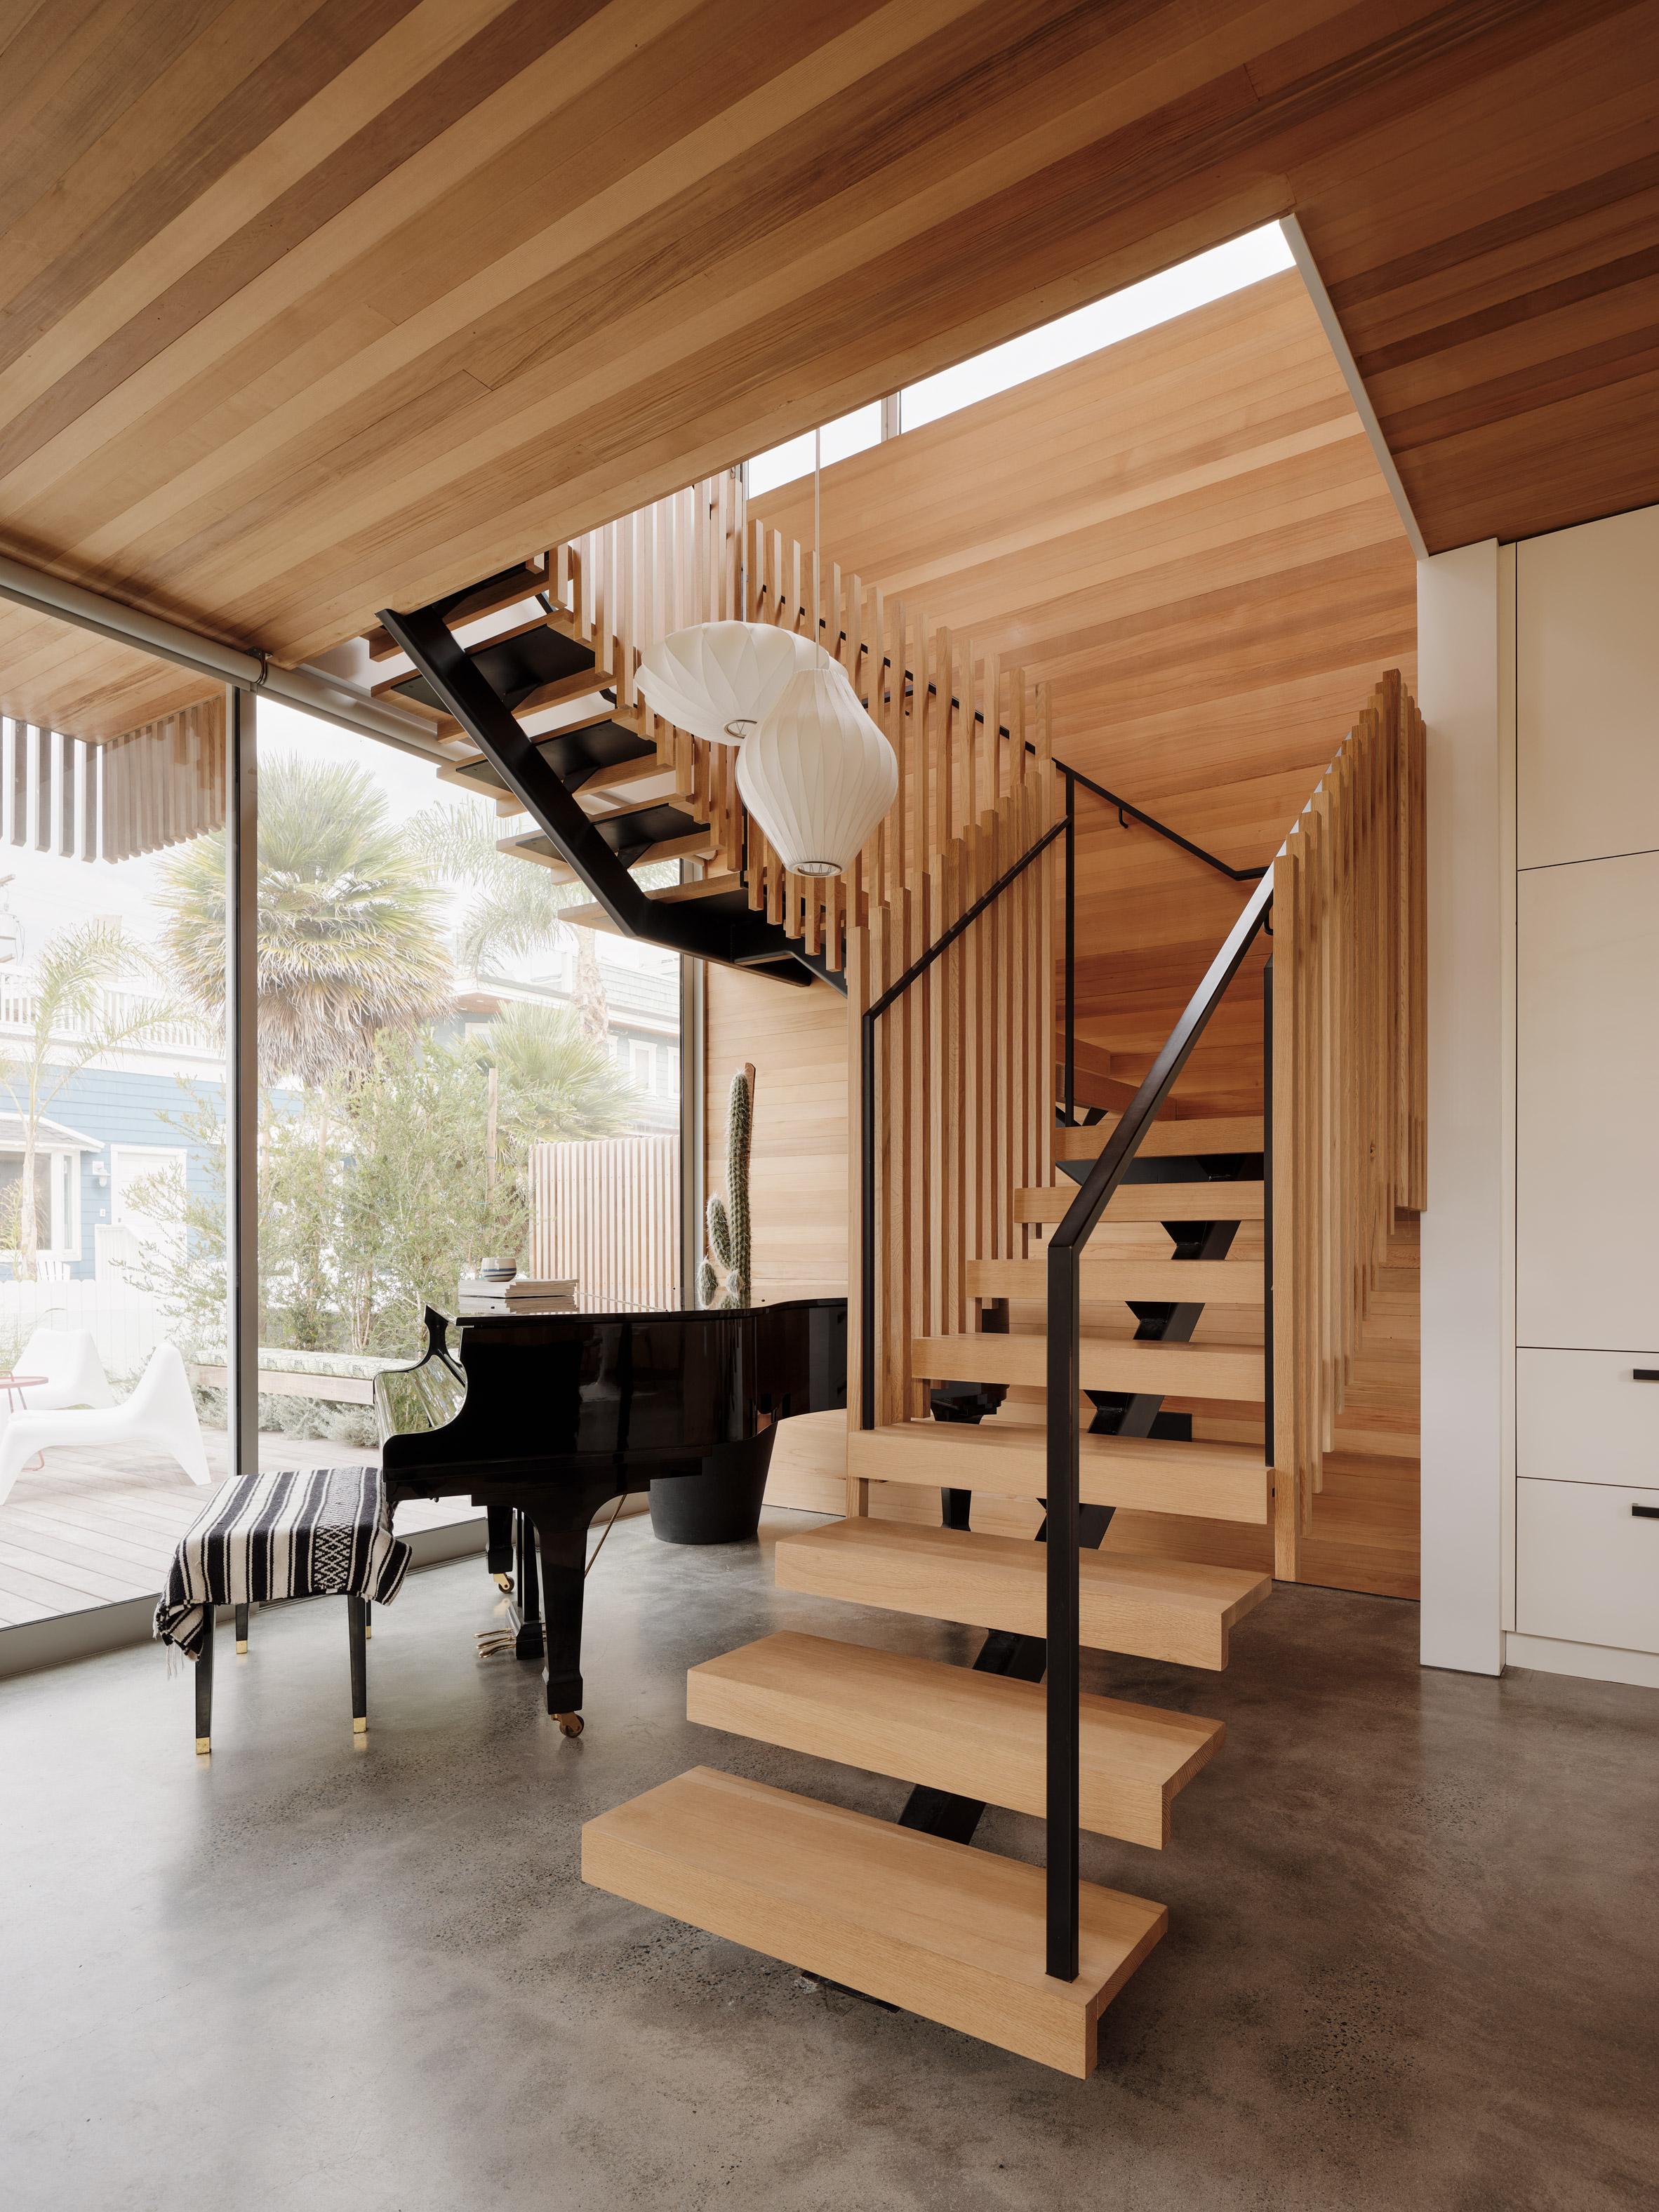 Walk-Street House by Ras-A Studio